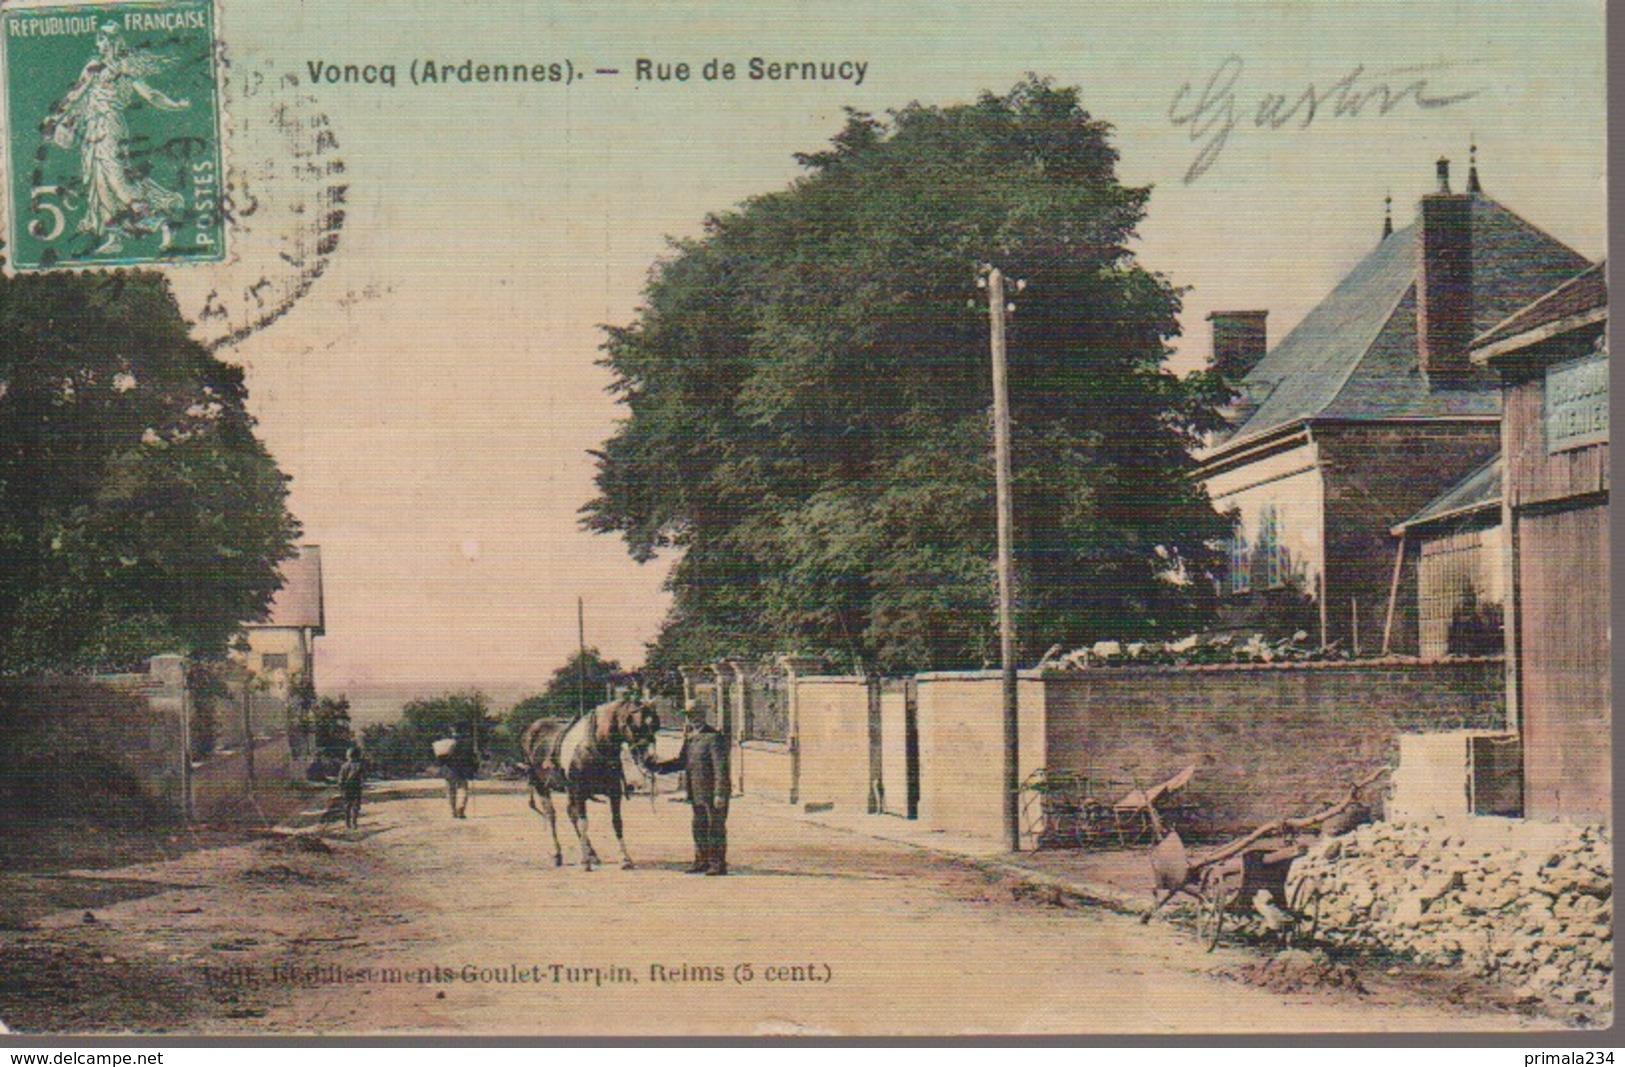 VONCQ - RUE DE SERNUCY - France